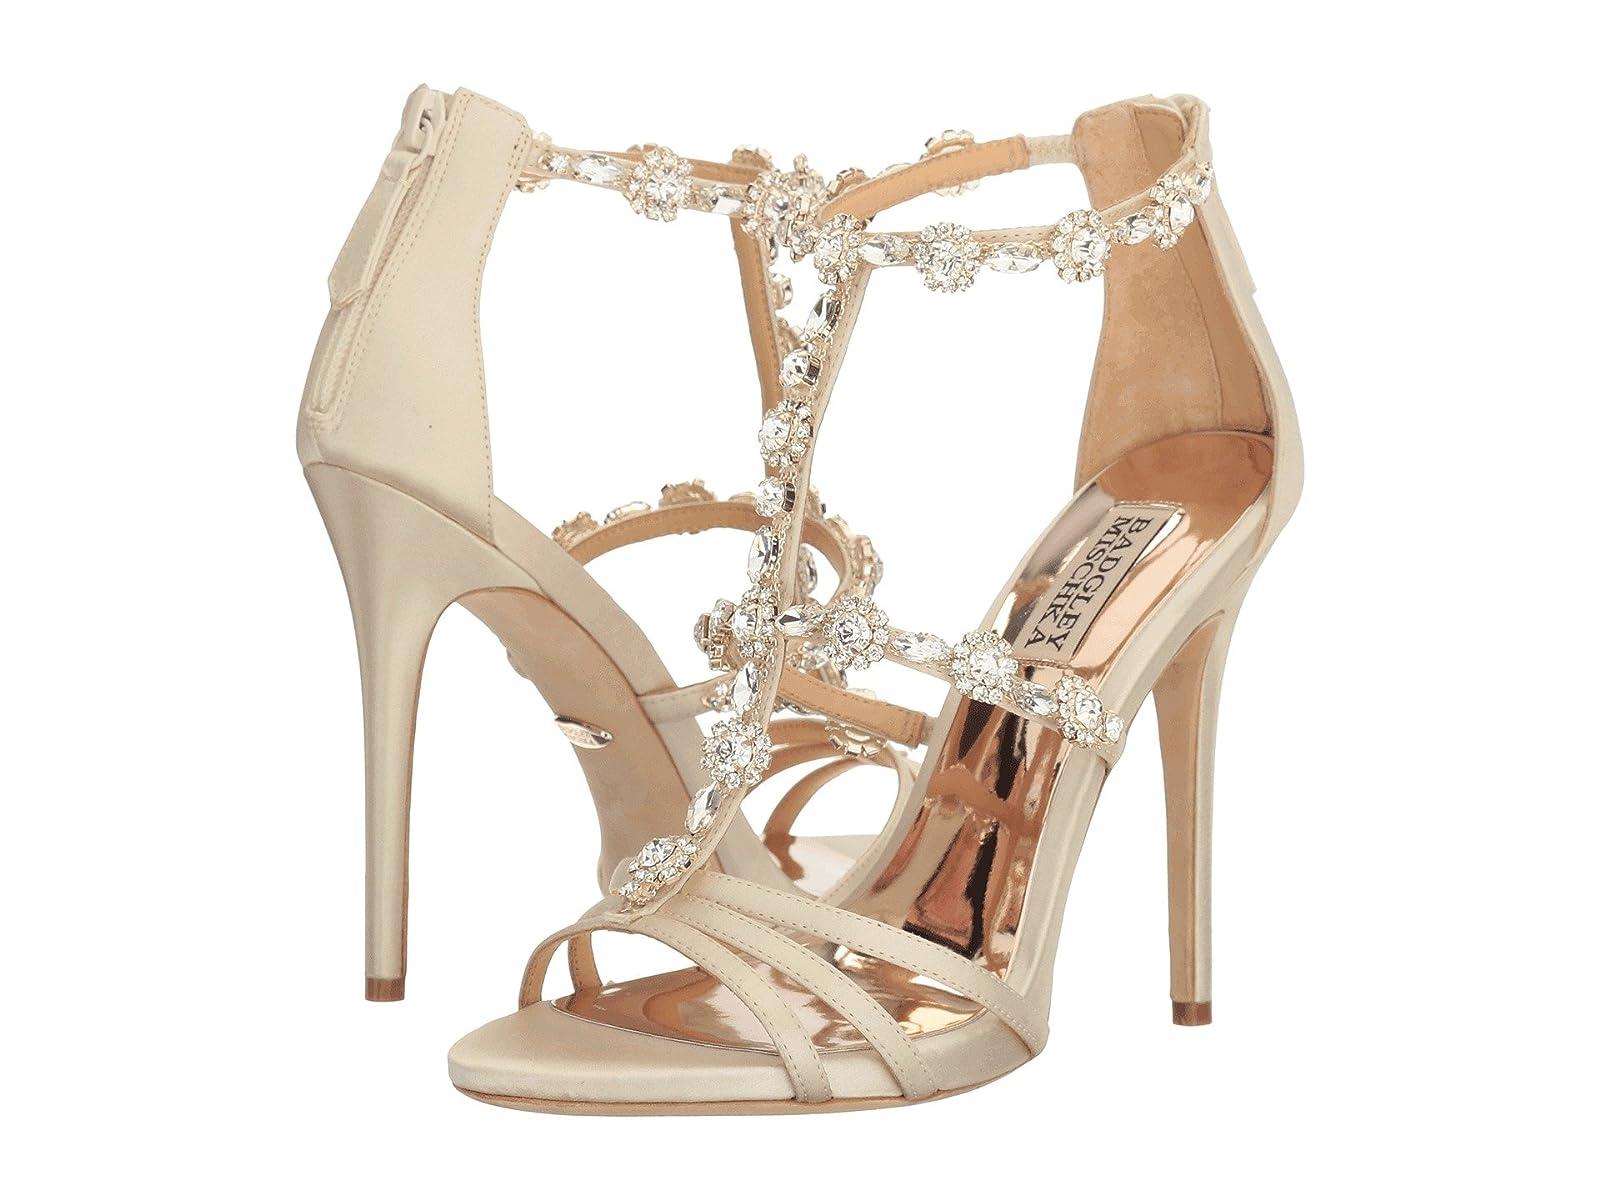 Badgley Mischka ThelmaCheap and distinctive eye-catching shoes